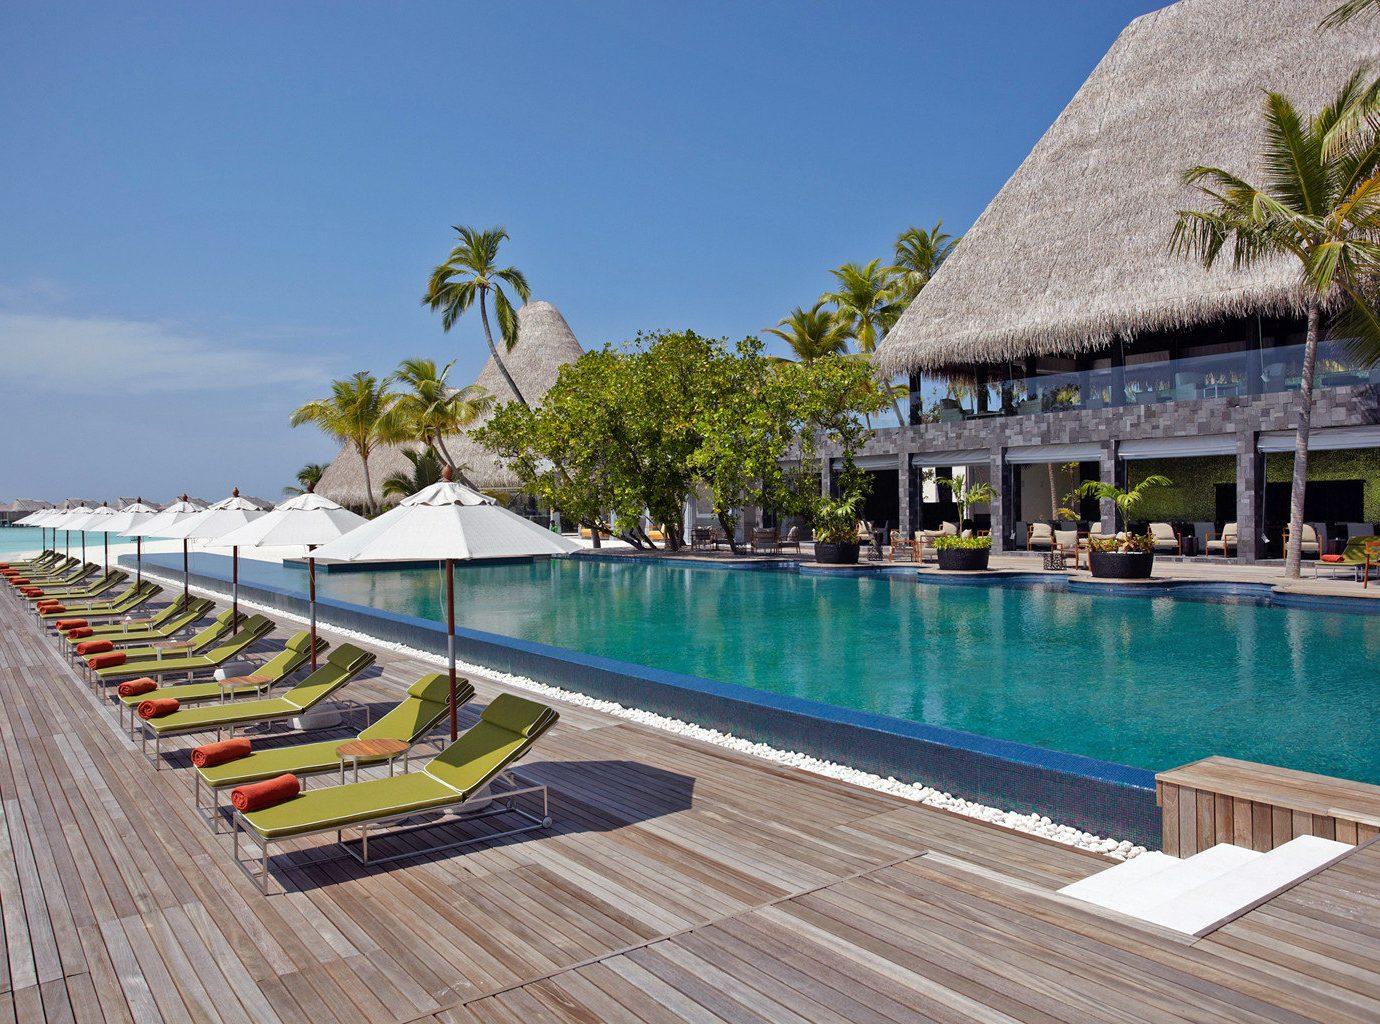 Beachfront Elegant Luxury Modern Pool Villa swimming pool chair leisure property Resort walkway caribbean Beach Sea boardwalk lined Deck